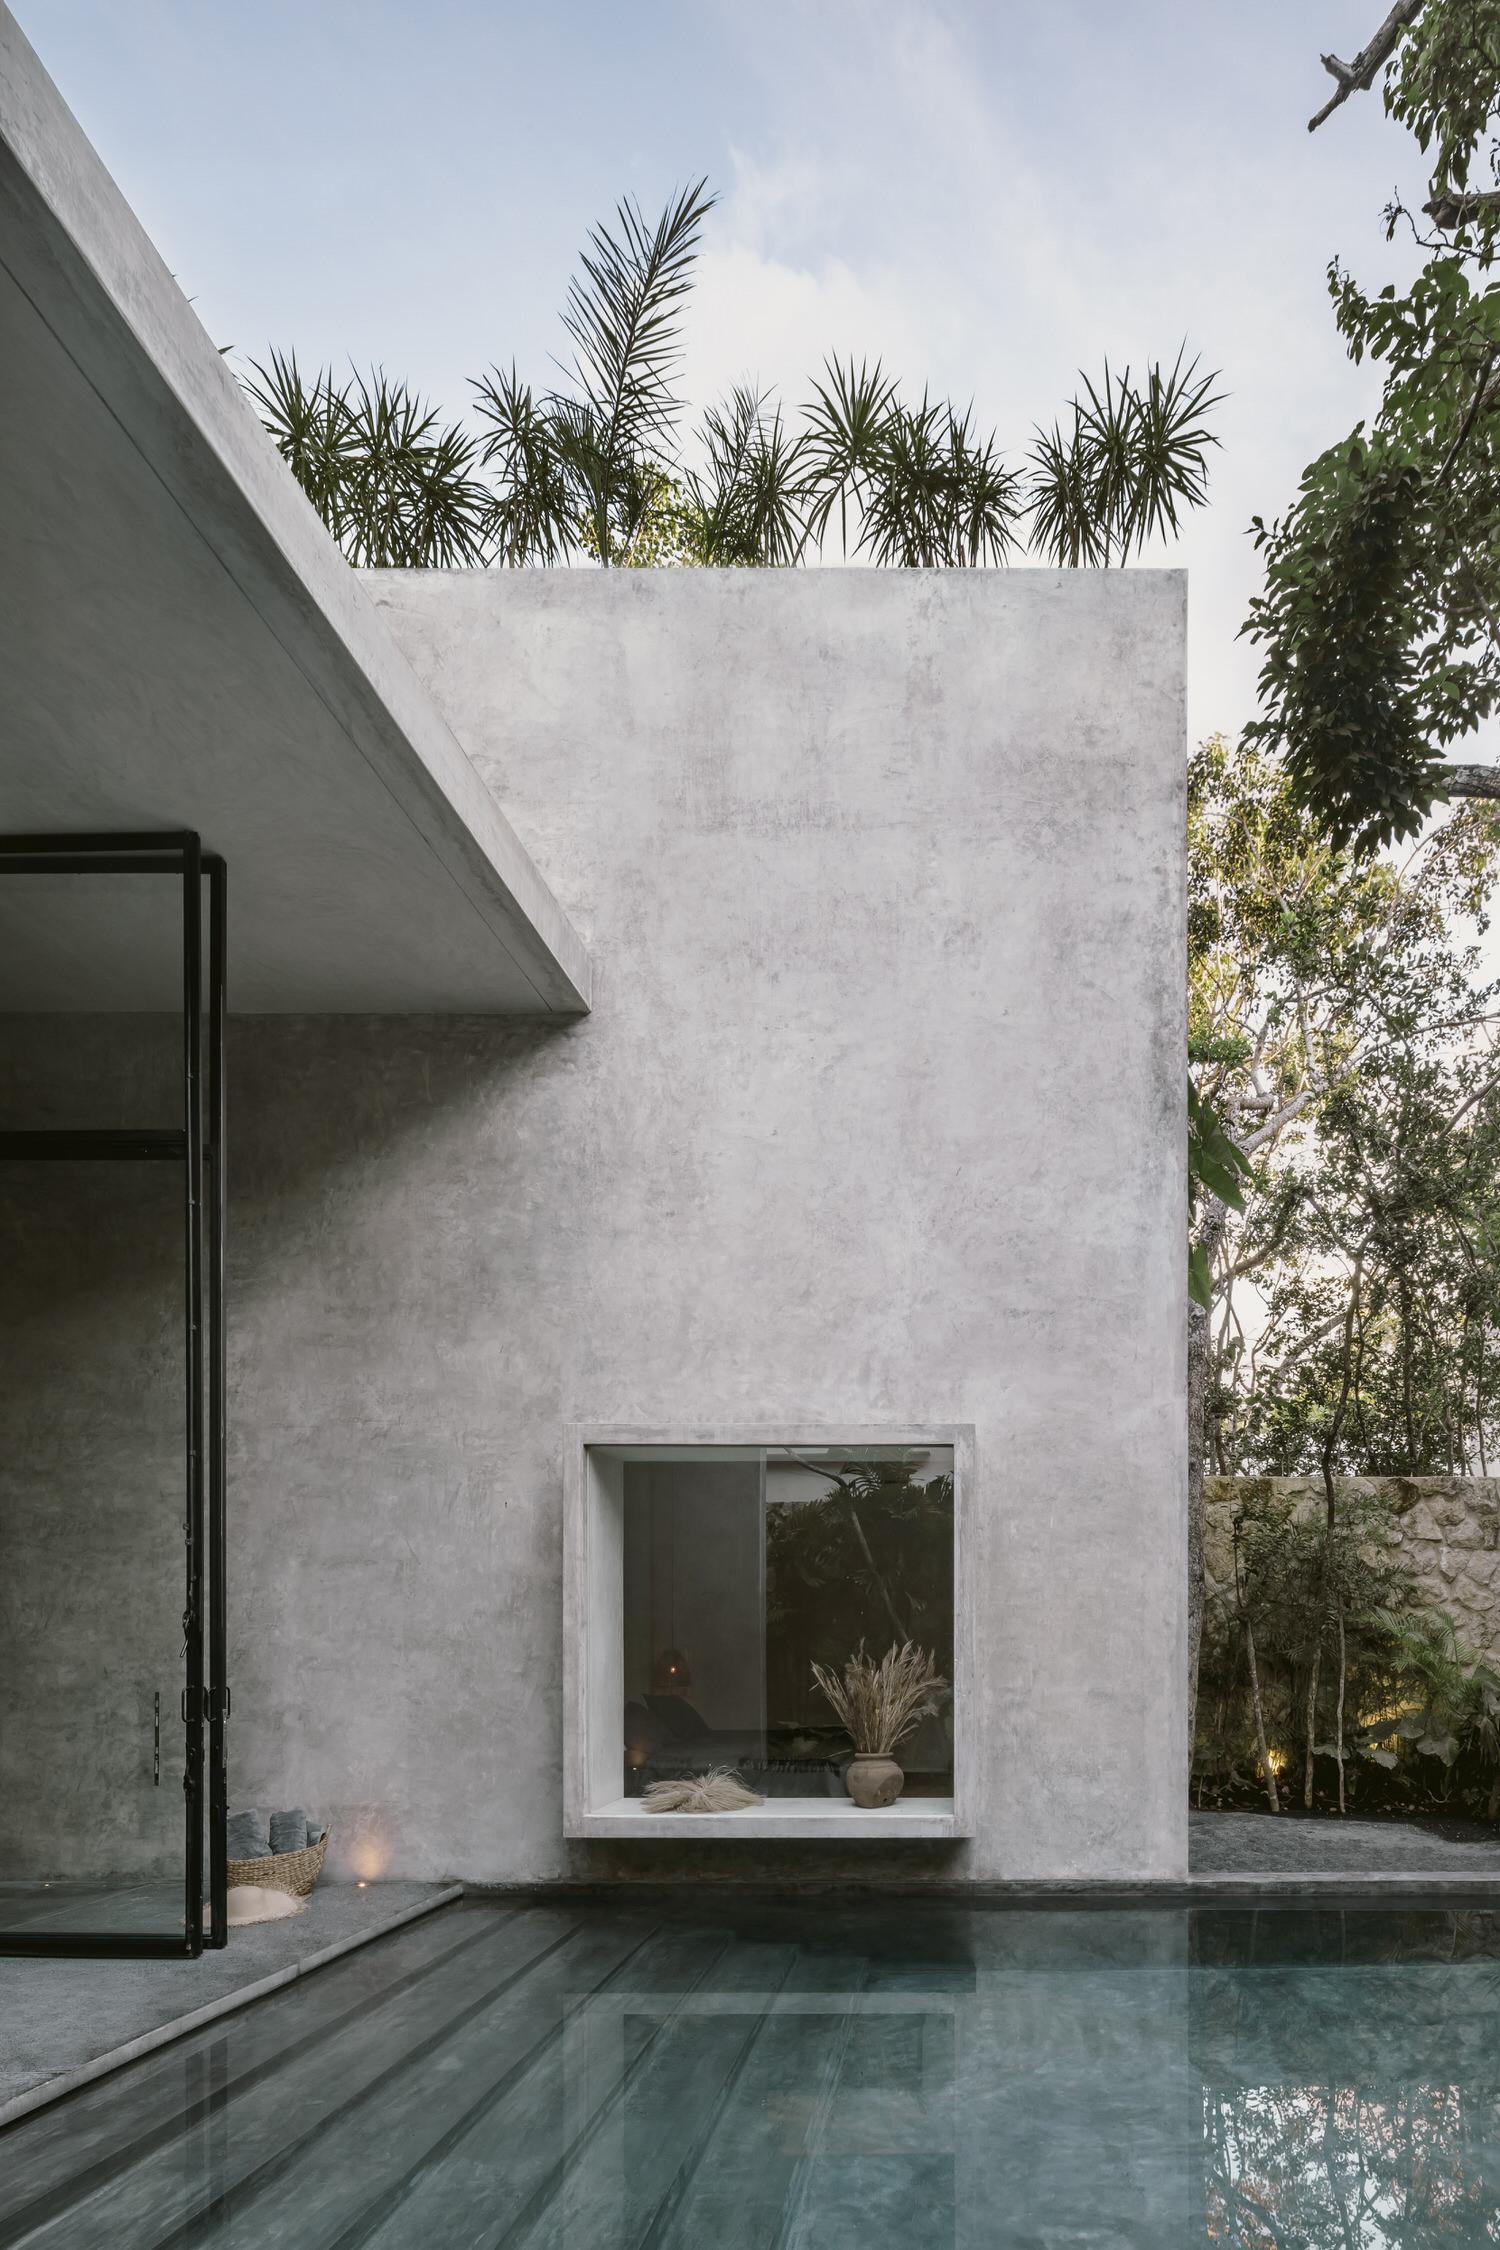 Co Lab Design Office Aviv House Tulum Mexico Arxhitecture Photo Cesar Bejar Yellowtrace 03